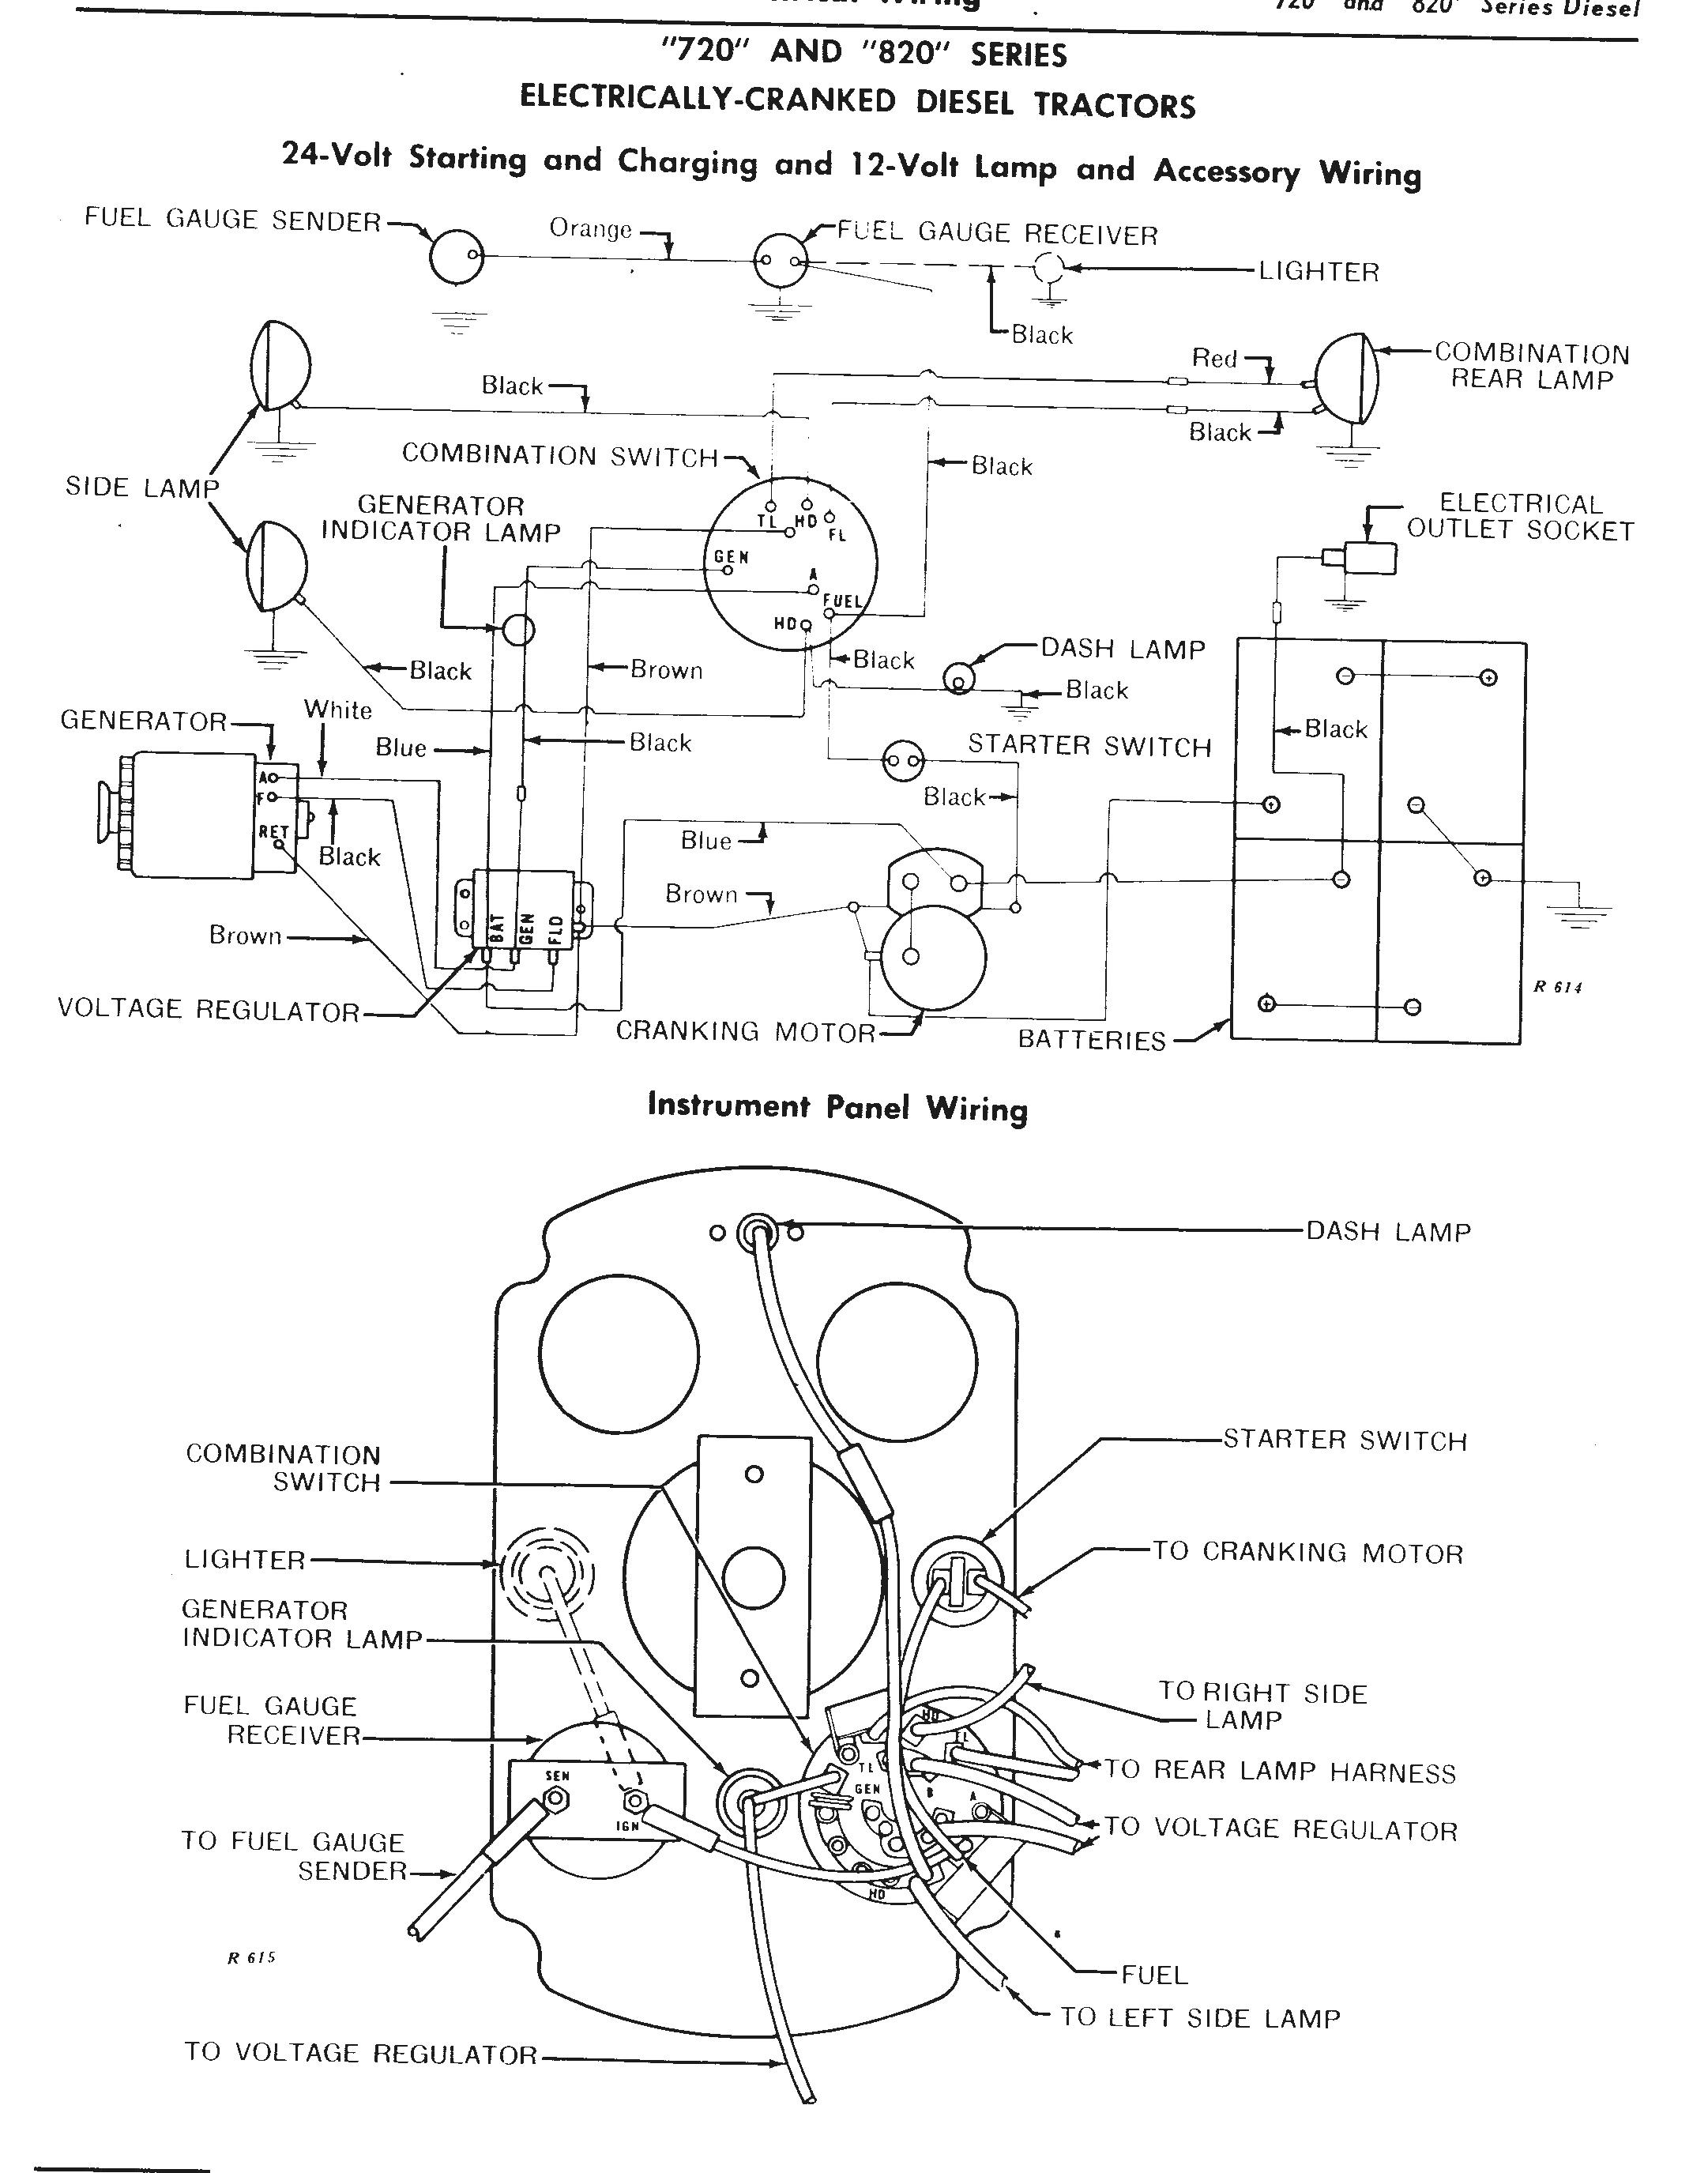 John Deere 3010 Lights Wiring Diagram The John Deere 24 Volt Electrical System Explained